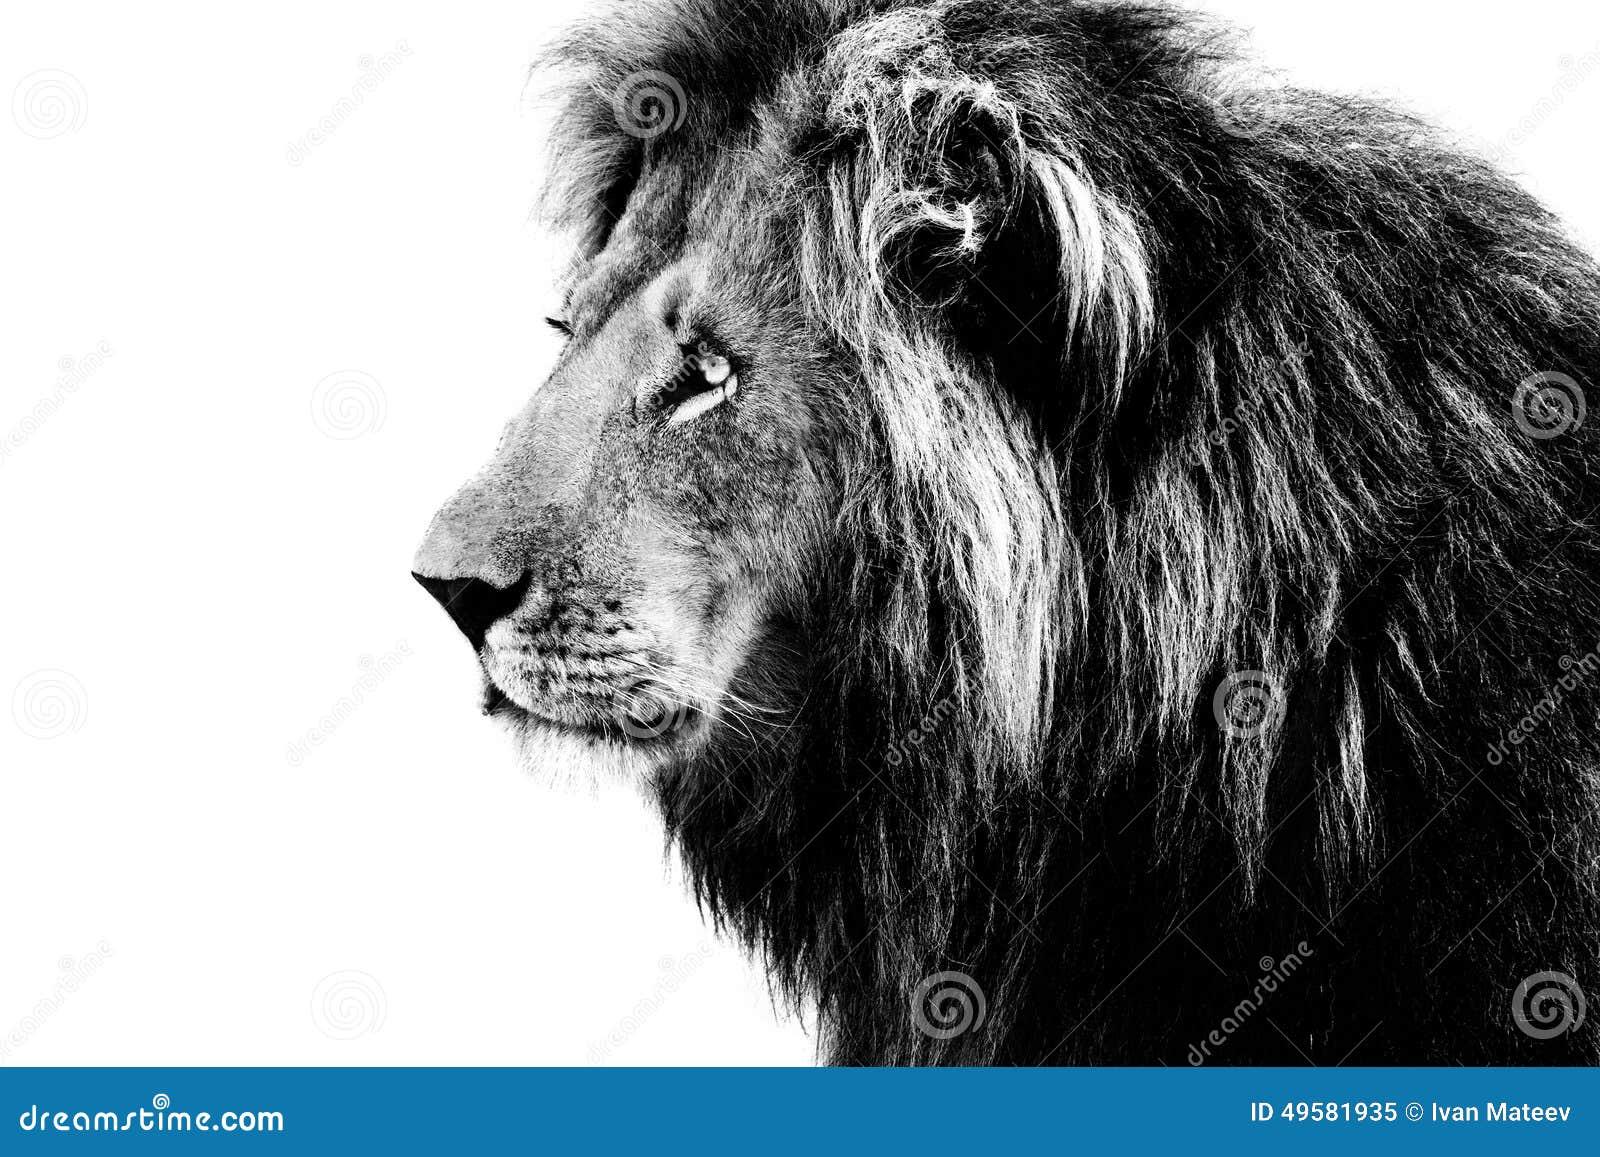 lion noir et blanc image stock image du verticale noir. Black Bedroom Furniture Sets. Home Design Ideas